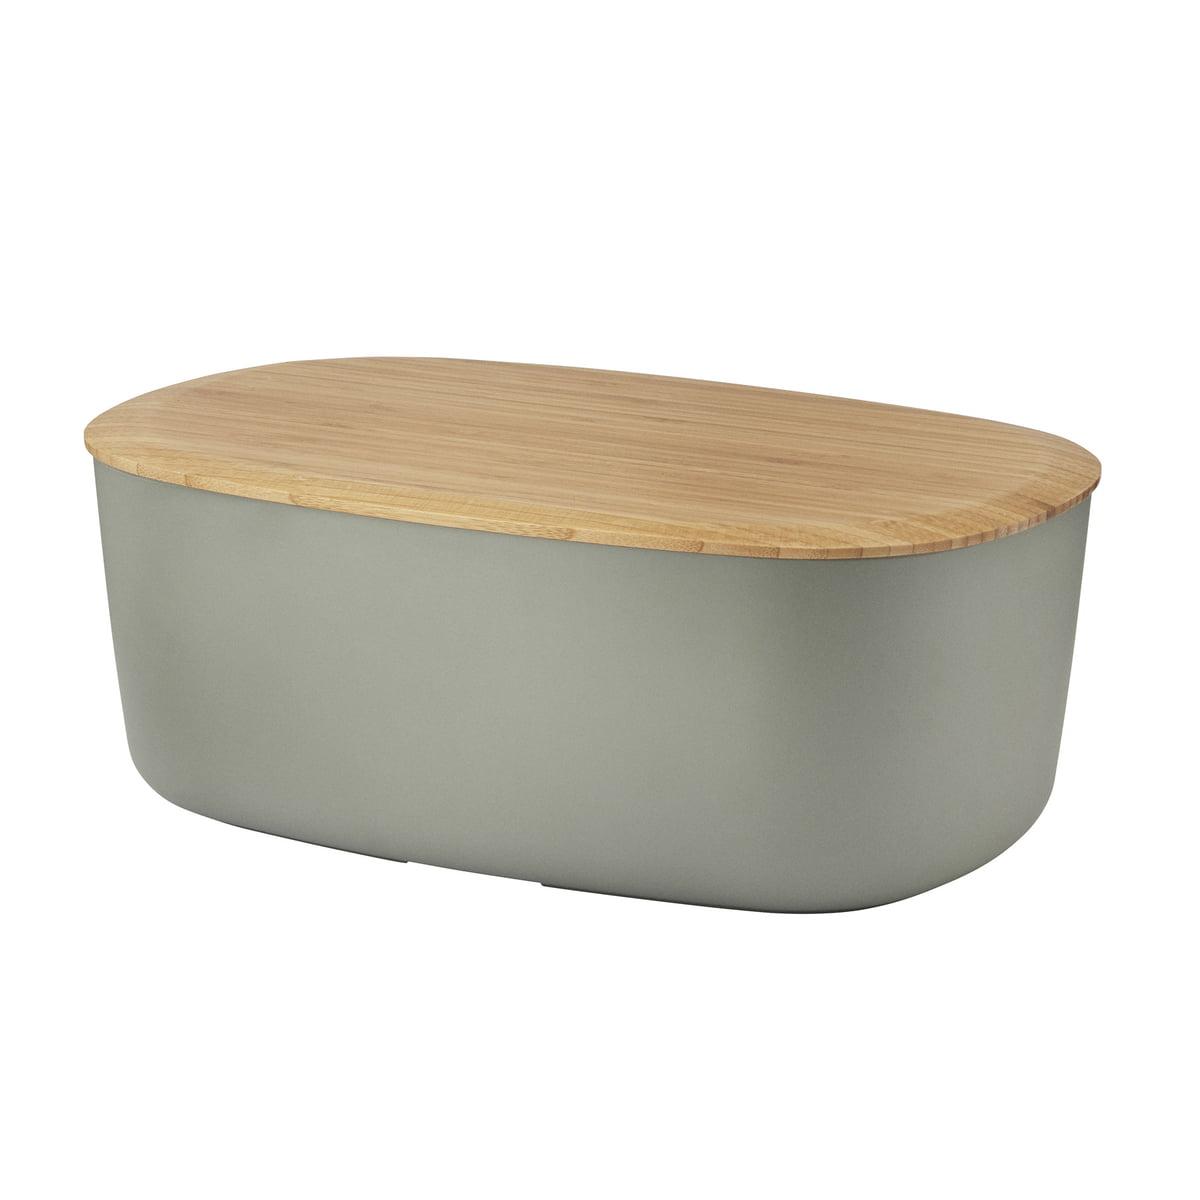 buy the stelton box it bread box online. Black Bedroom Furniture Sets. Home Design Ideas